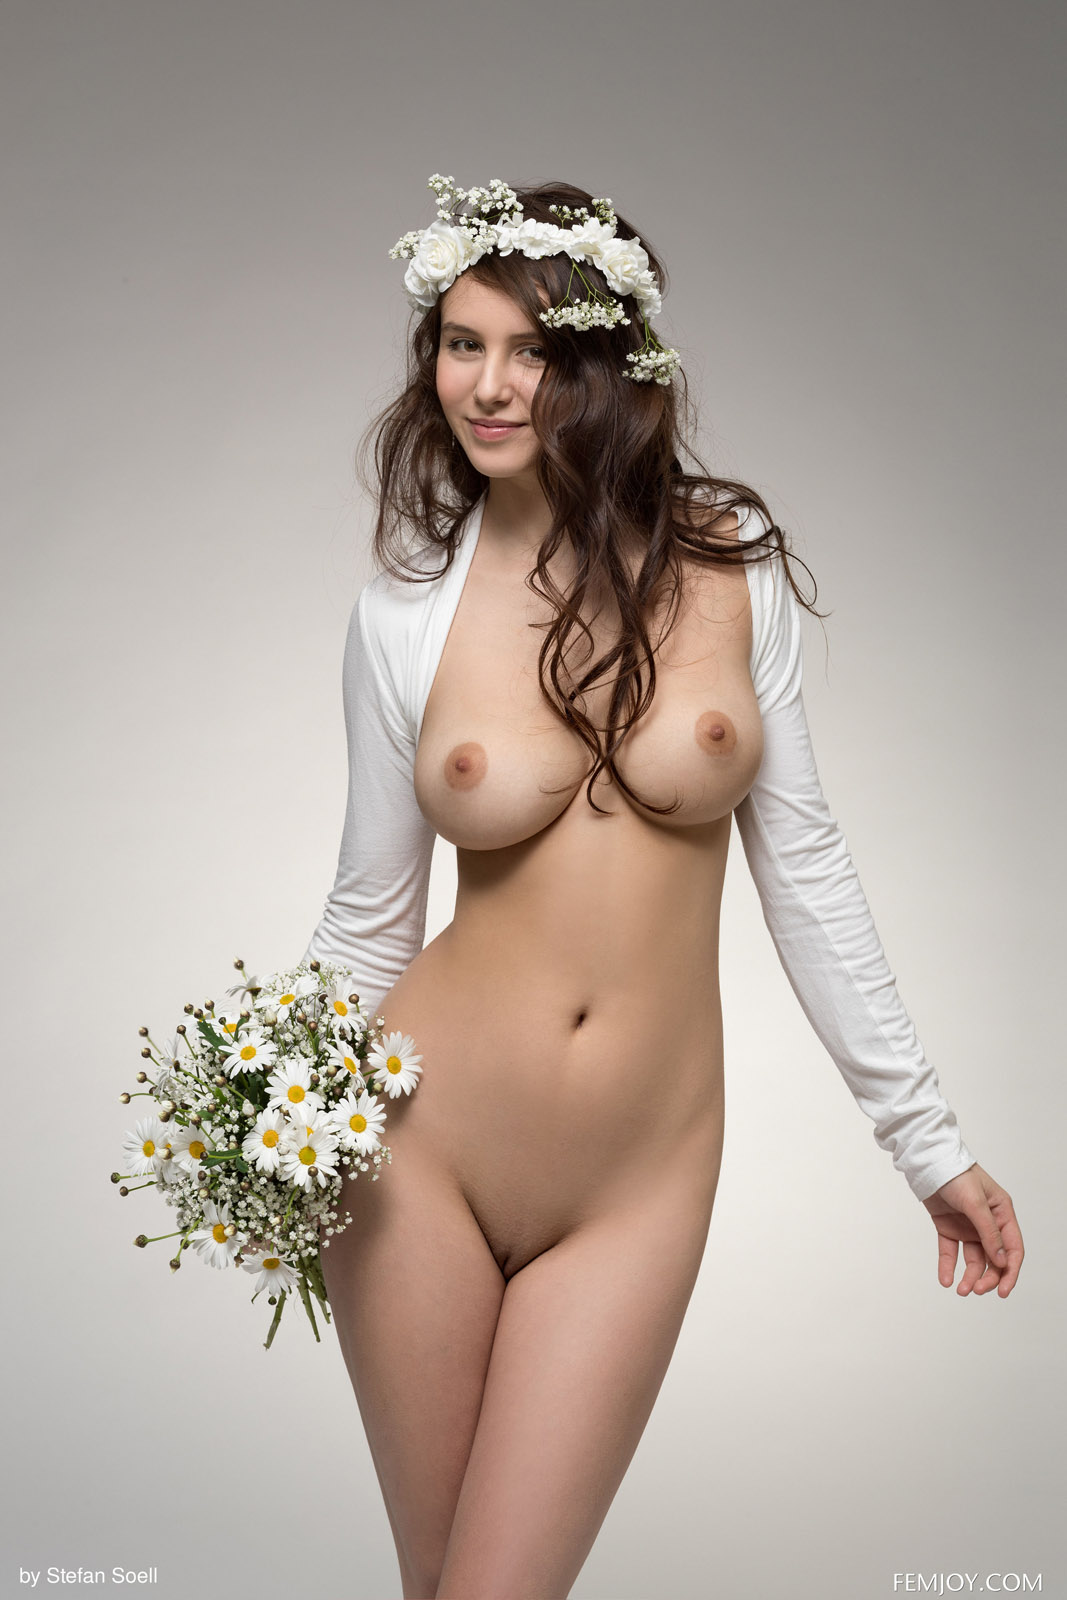 Femjoy alisa g nude ready